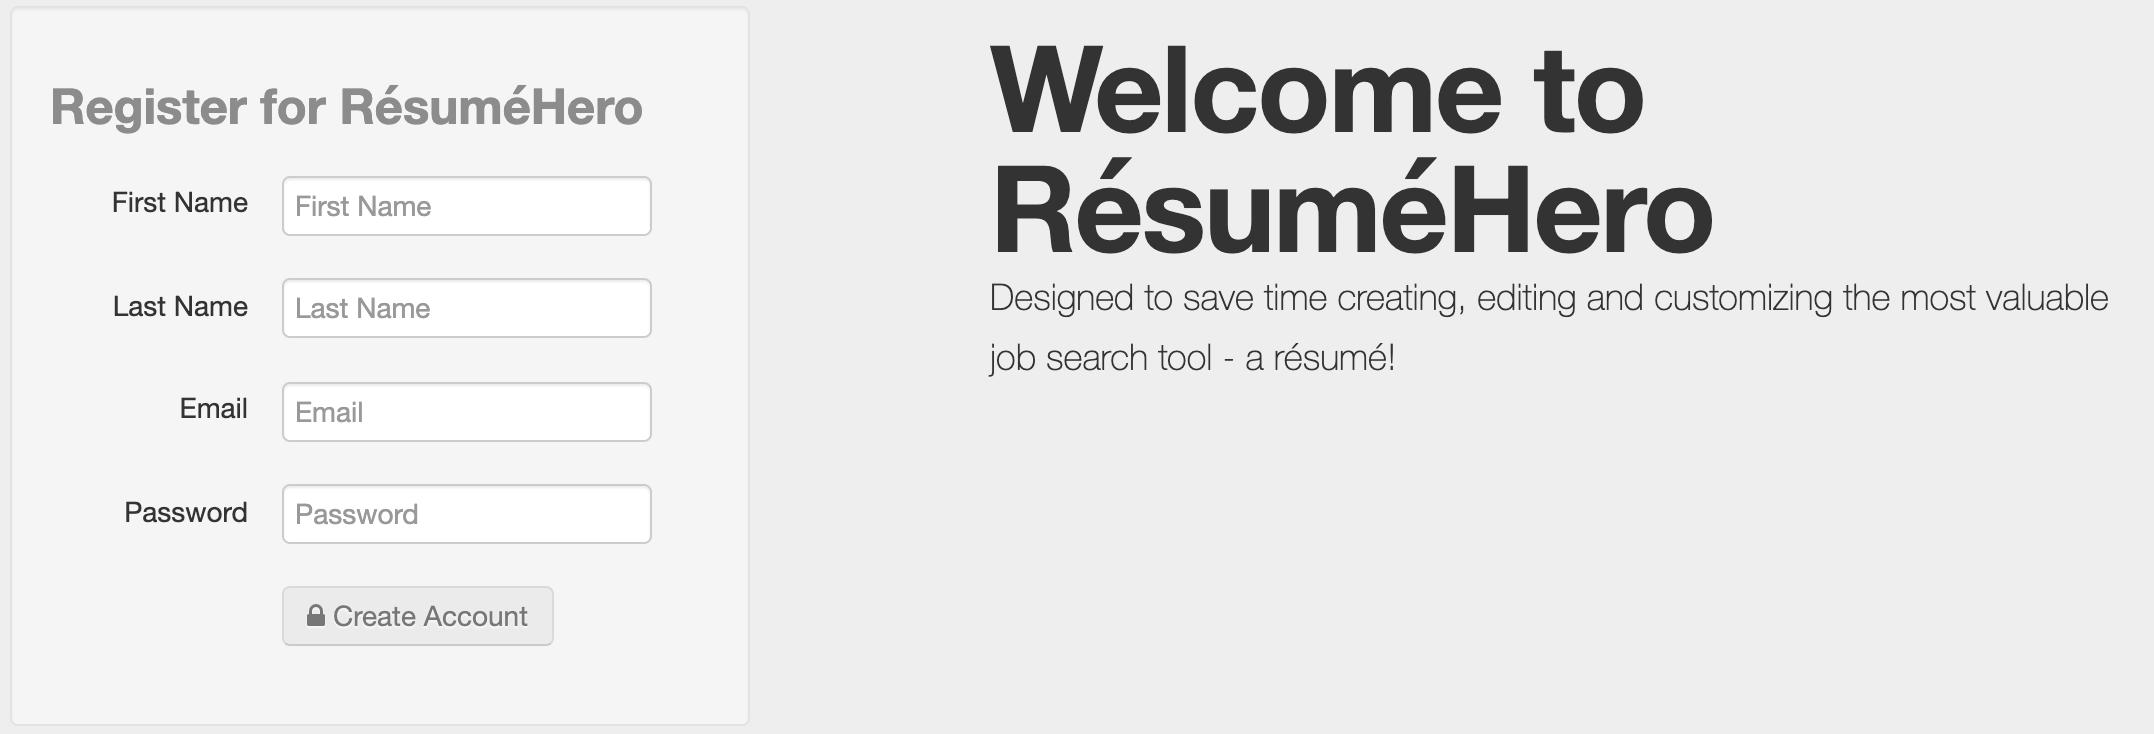 resume login screen capture